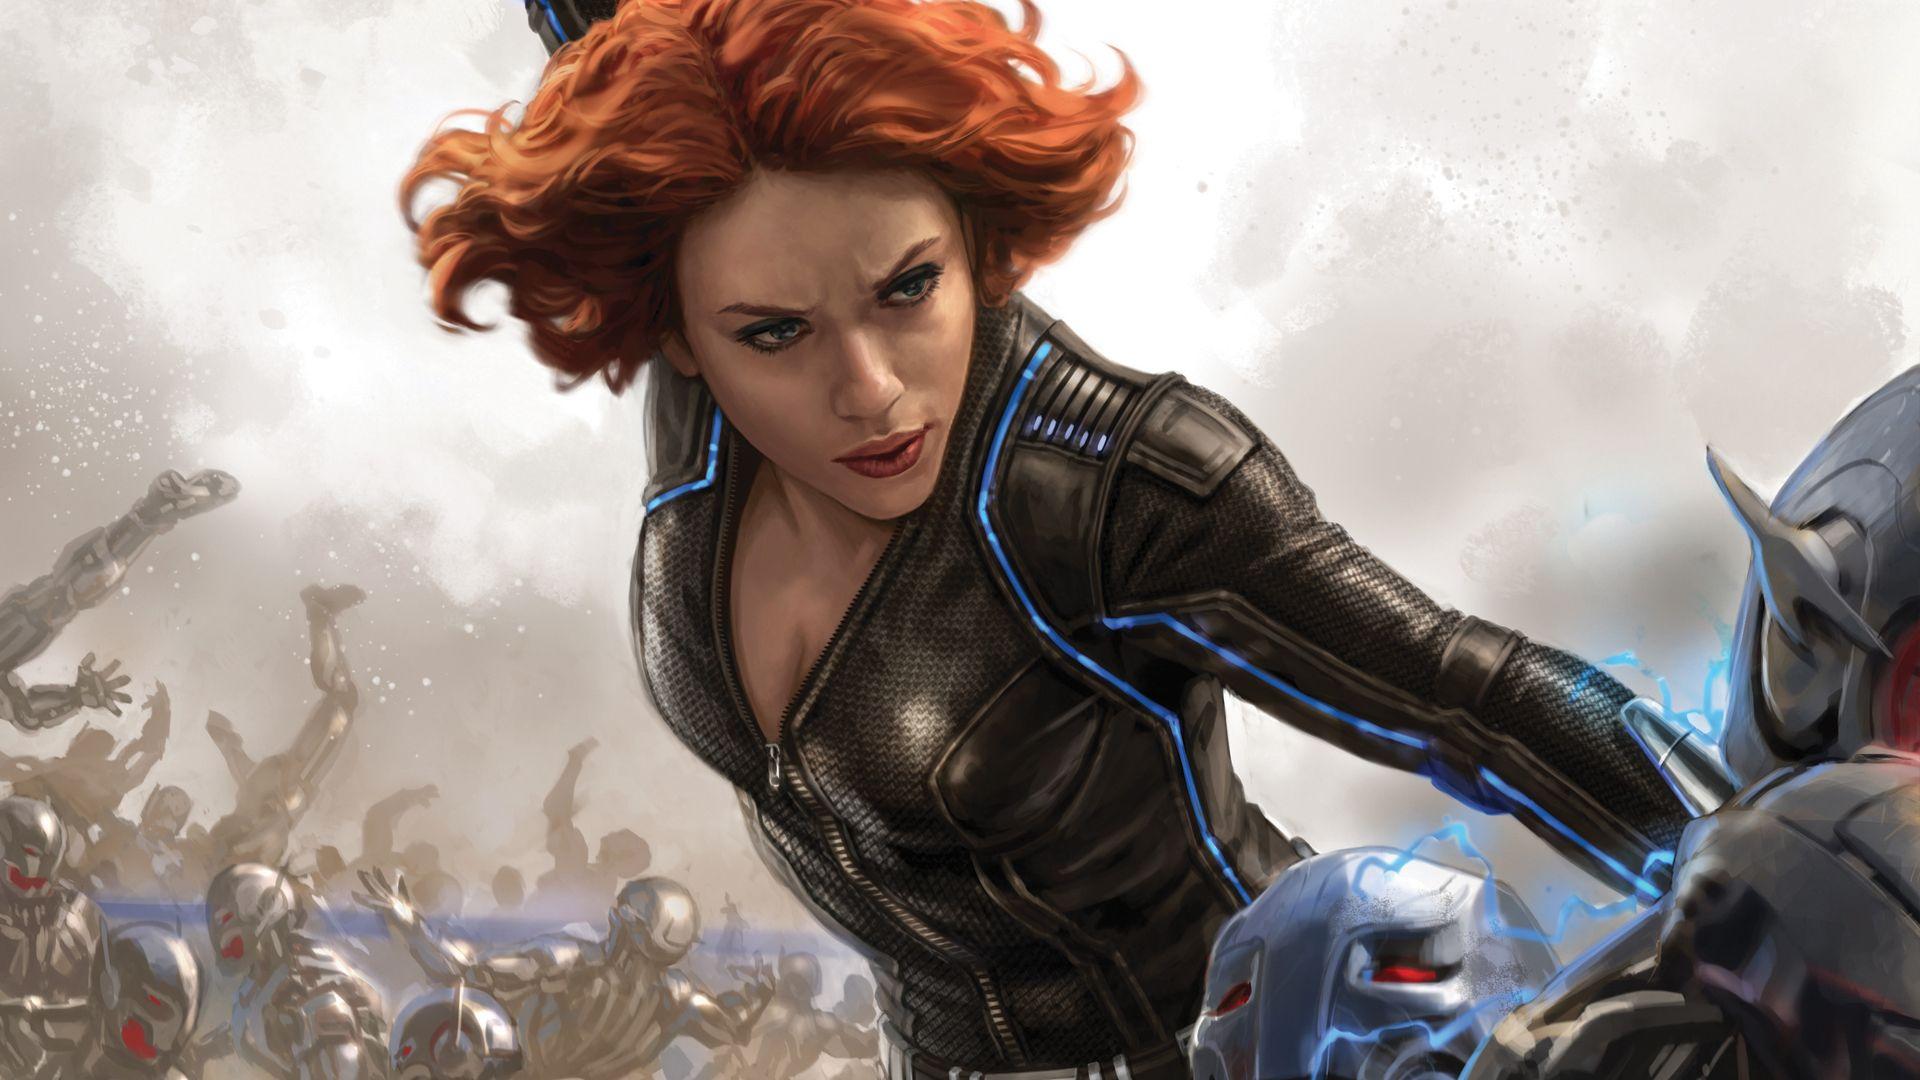 avengers age of ultron hulk hawkeye captain iron man wallpapers 4k pinterest black widow avengers avengers and hawkeye